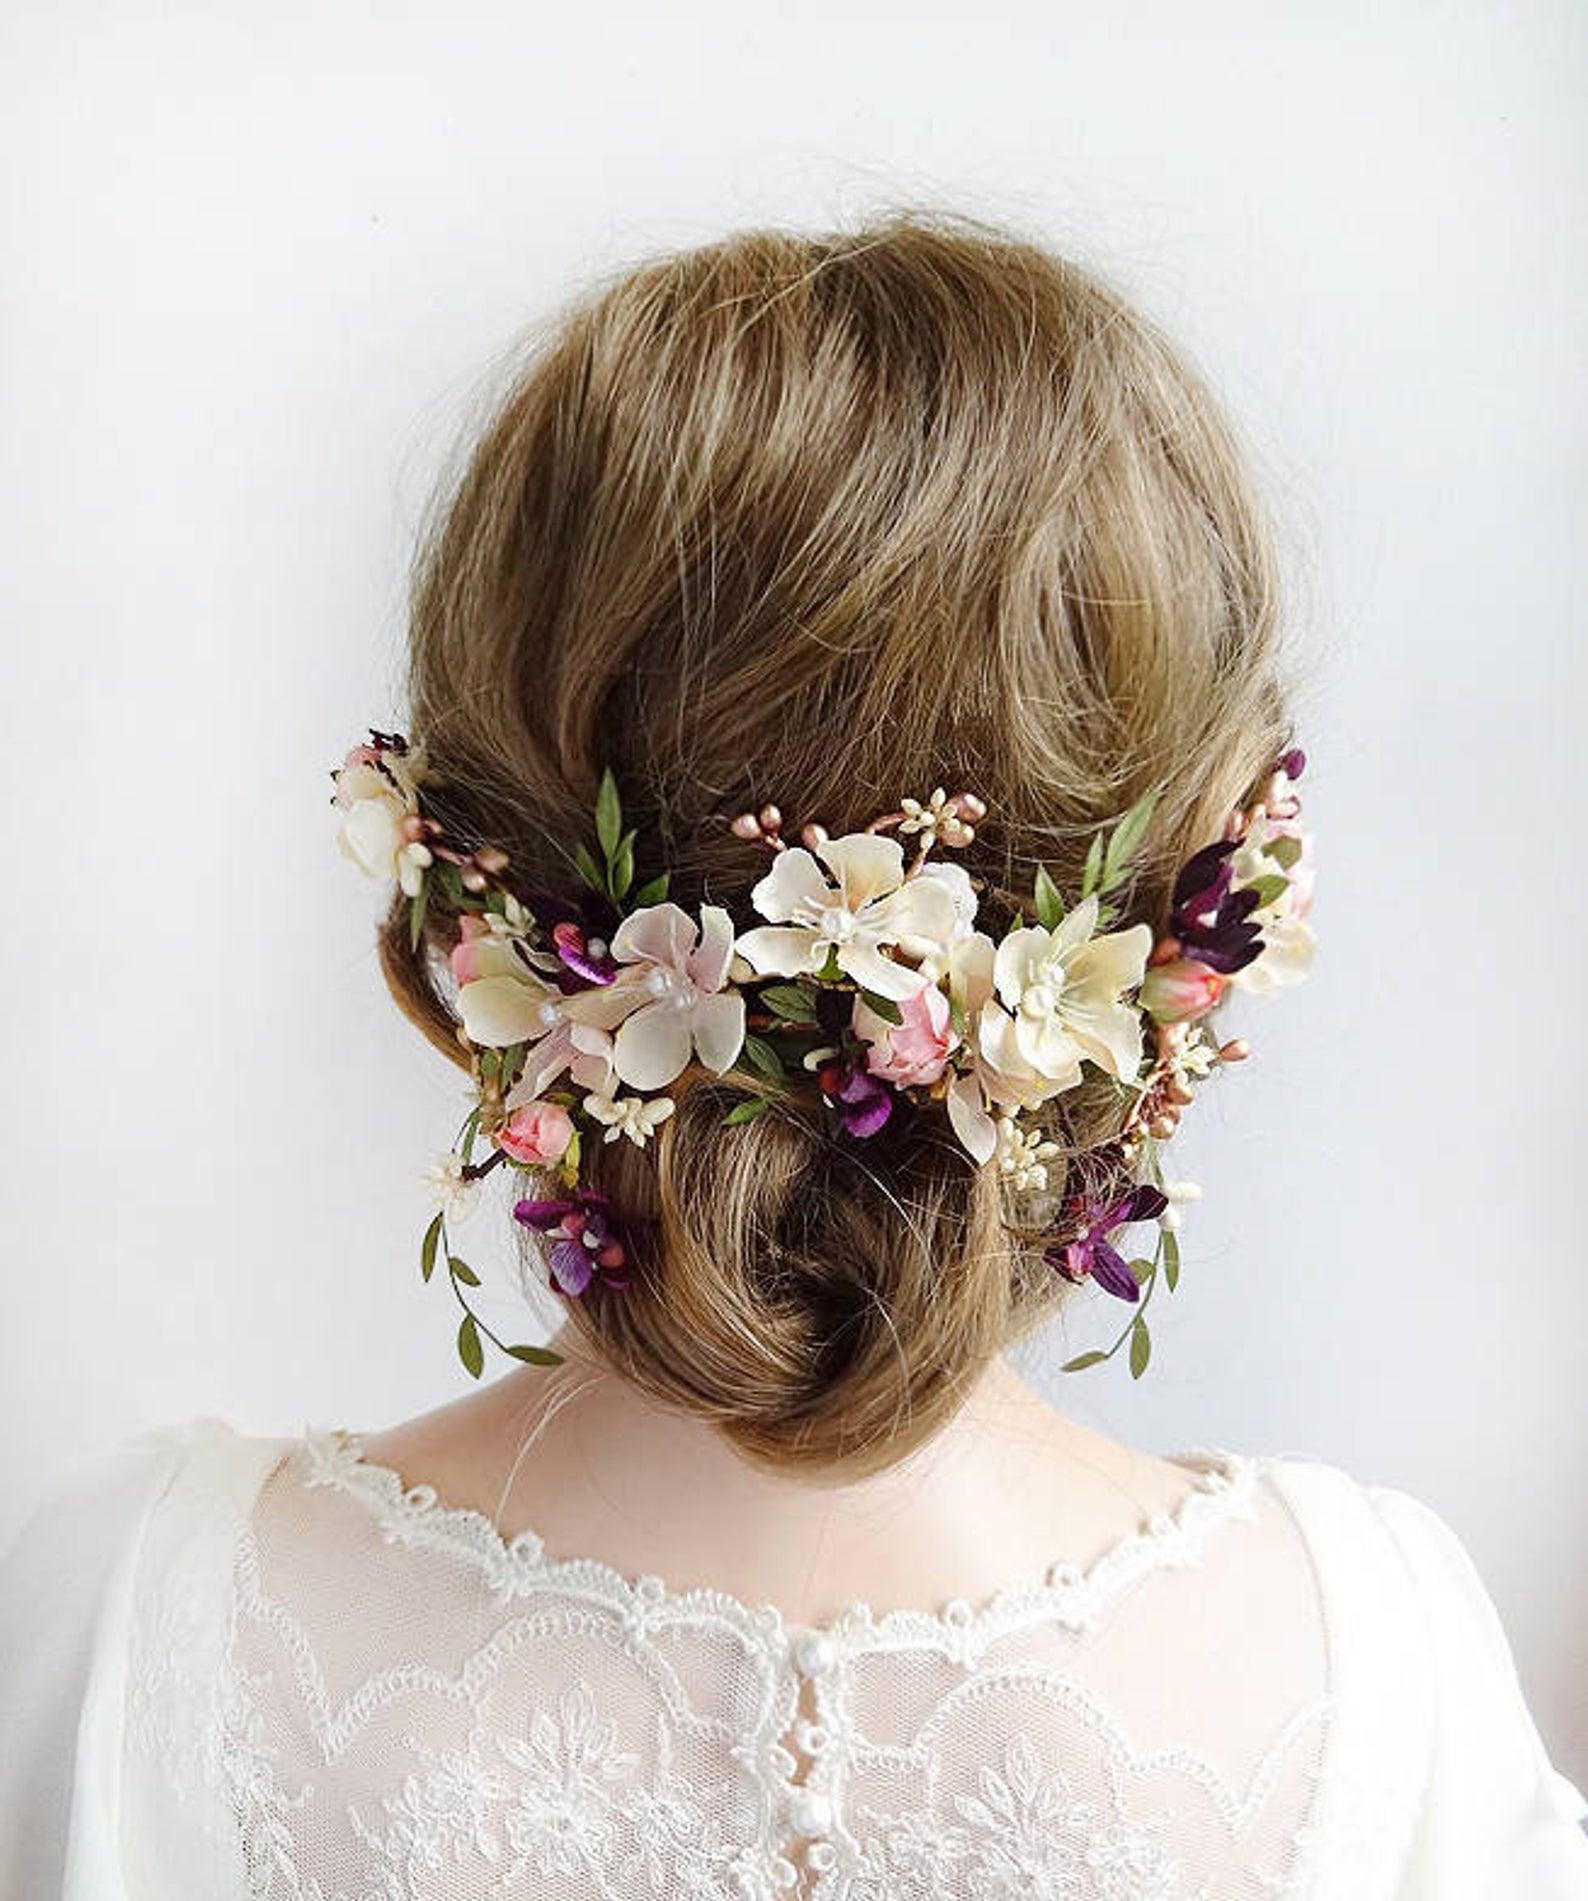 Bridal Headpiece Rose Gold Wedding Headpiece Rose Gold Etsy Flower Hair Accessories Wedding Floral Headpiece Wedding Bridal Hair Pieces Flower